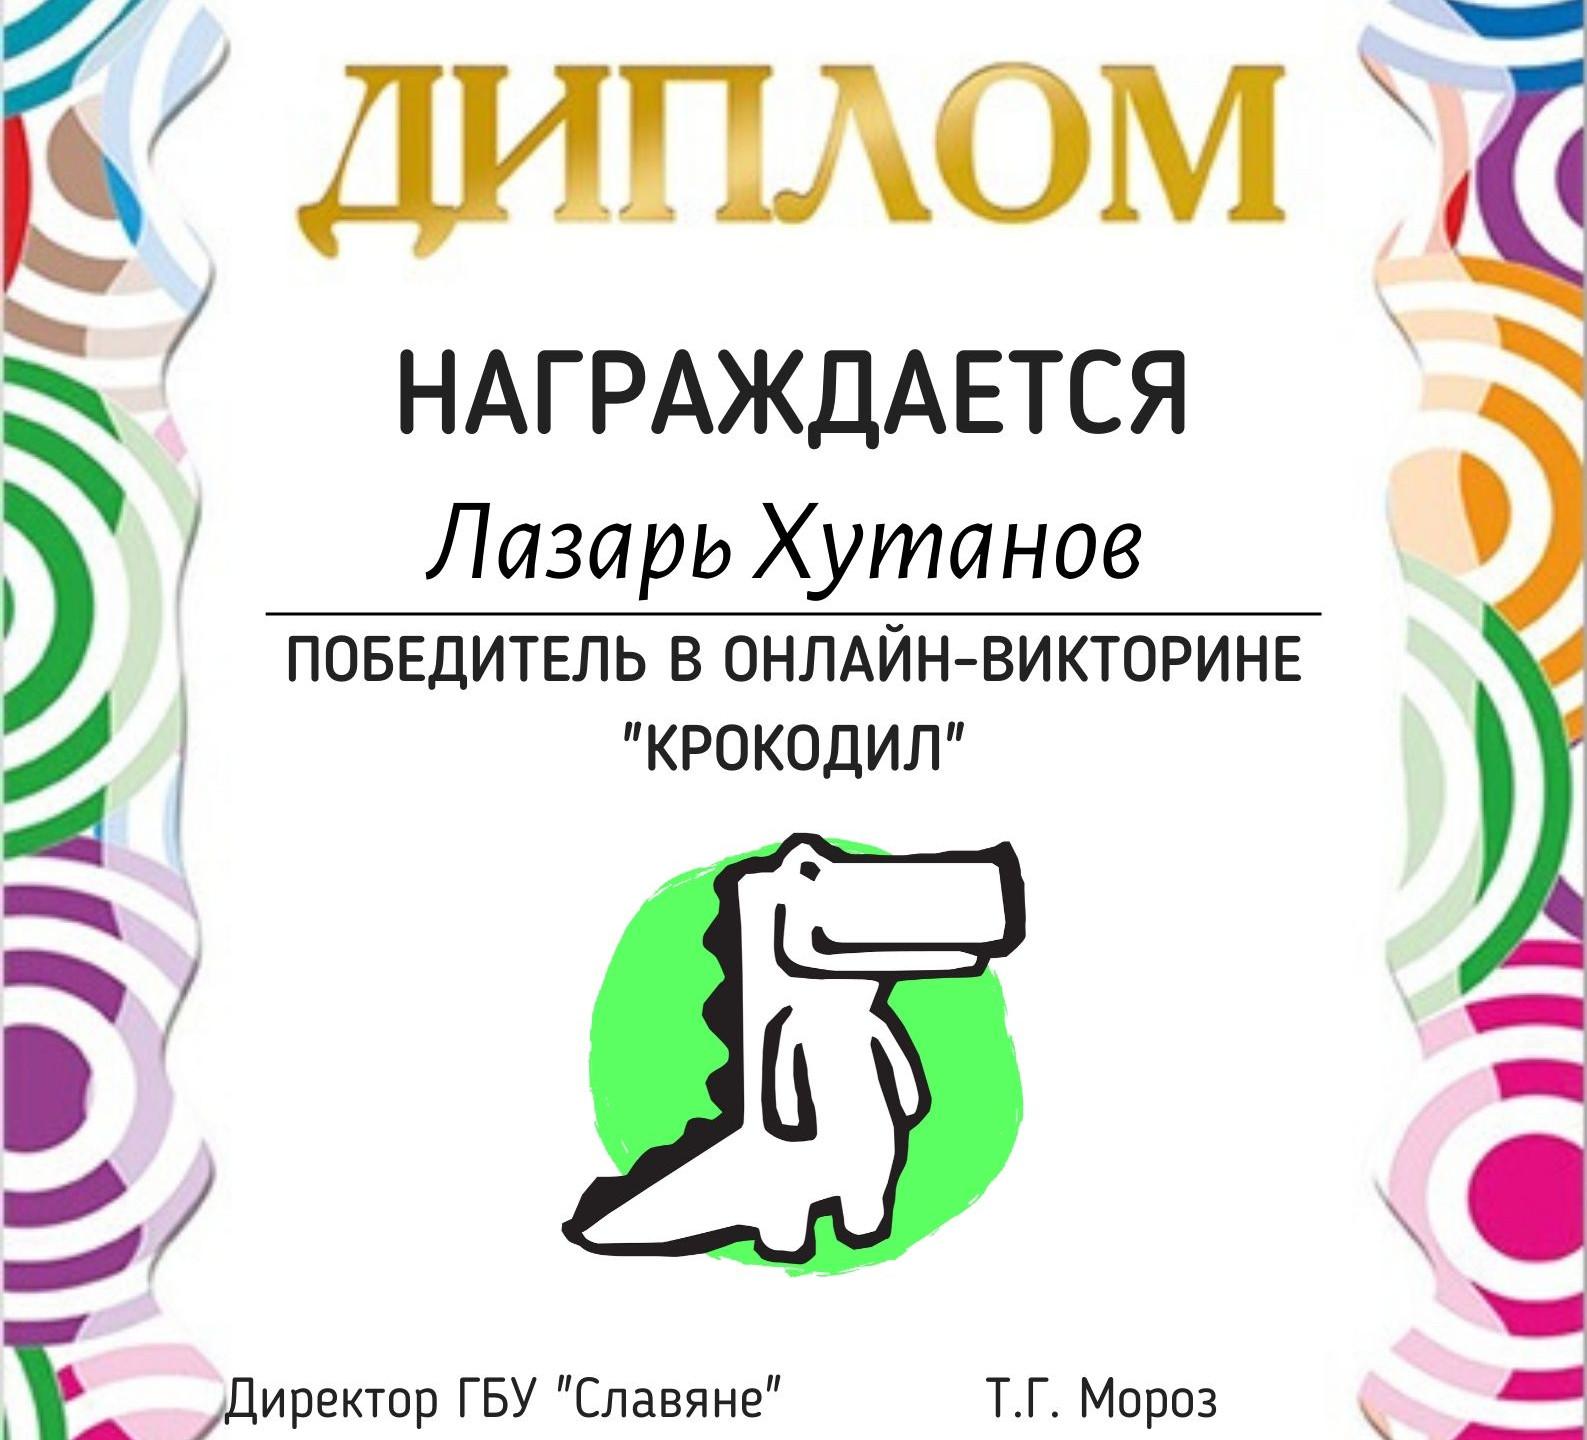 Грамота, копия (3)